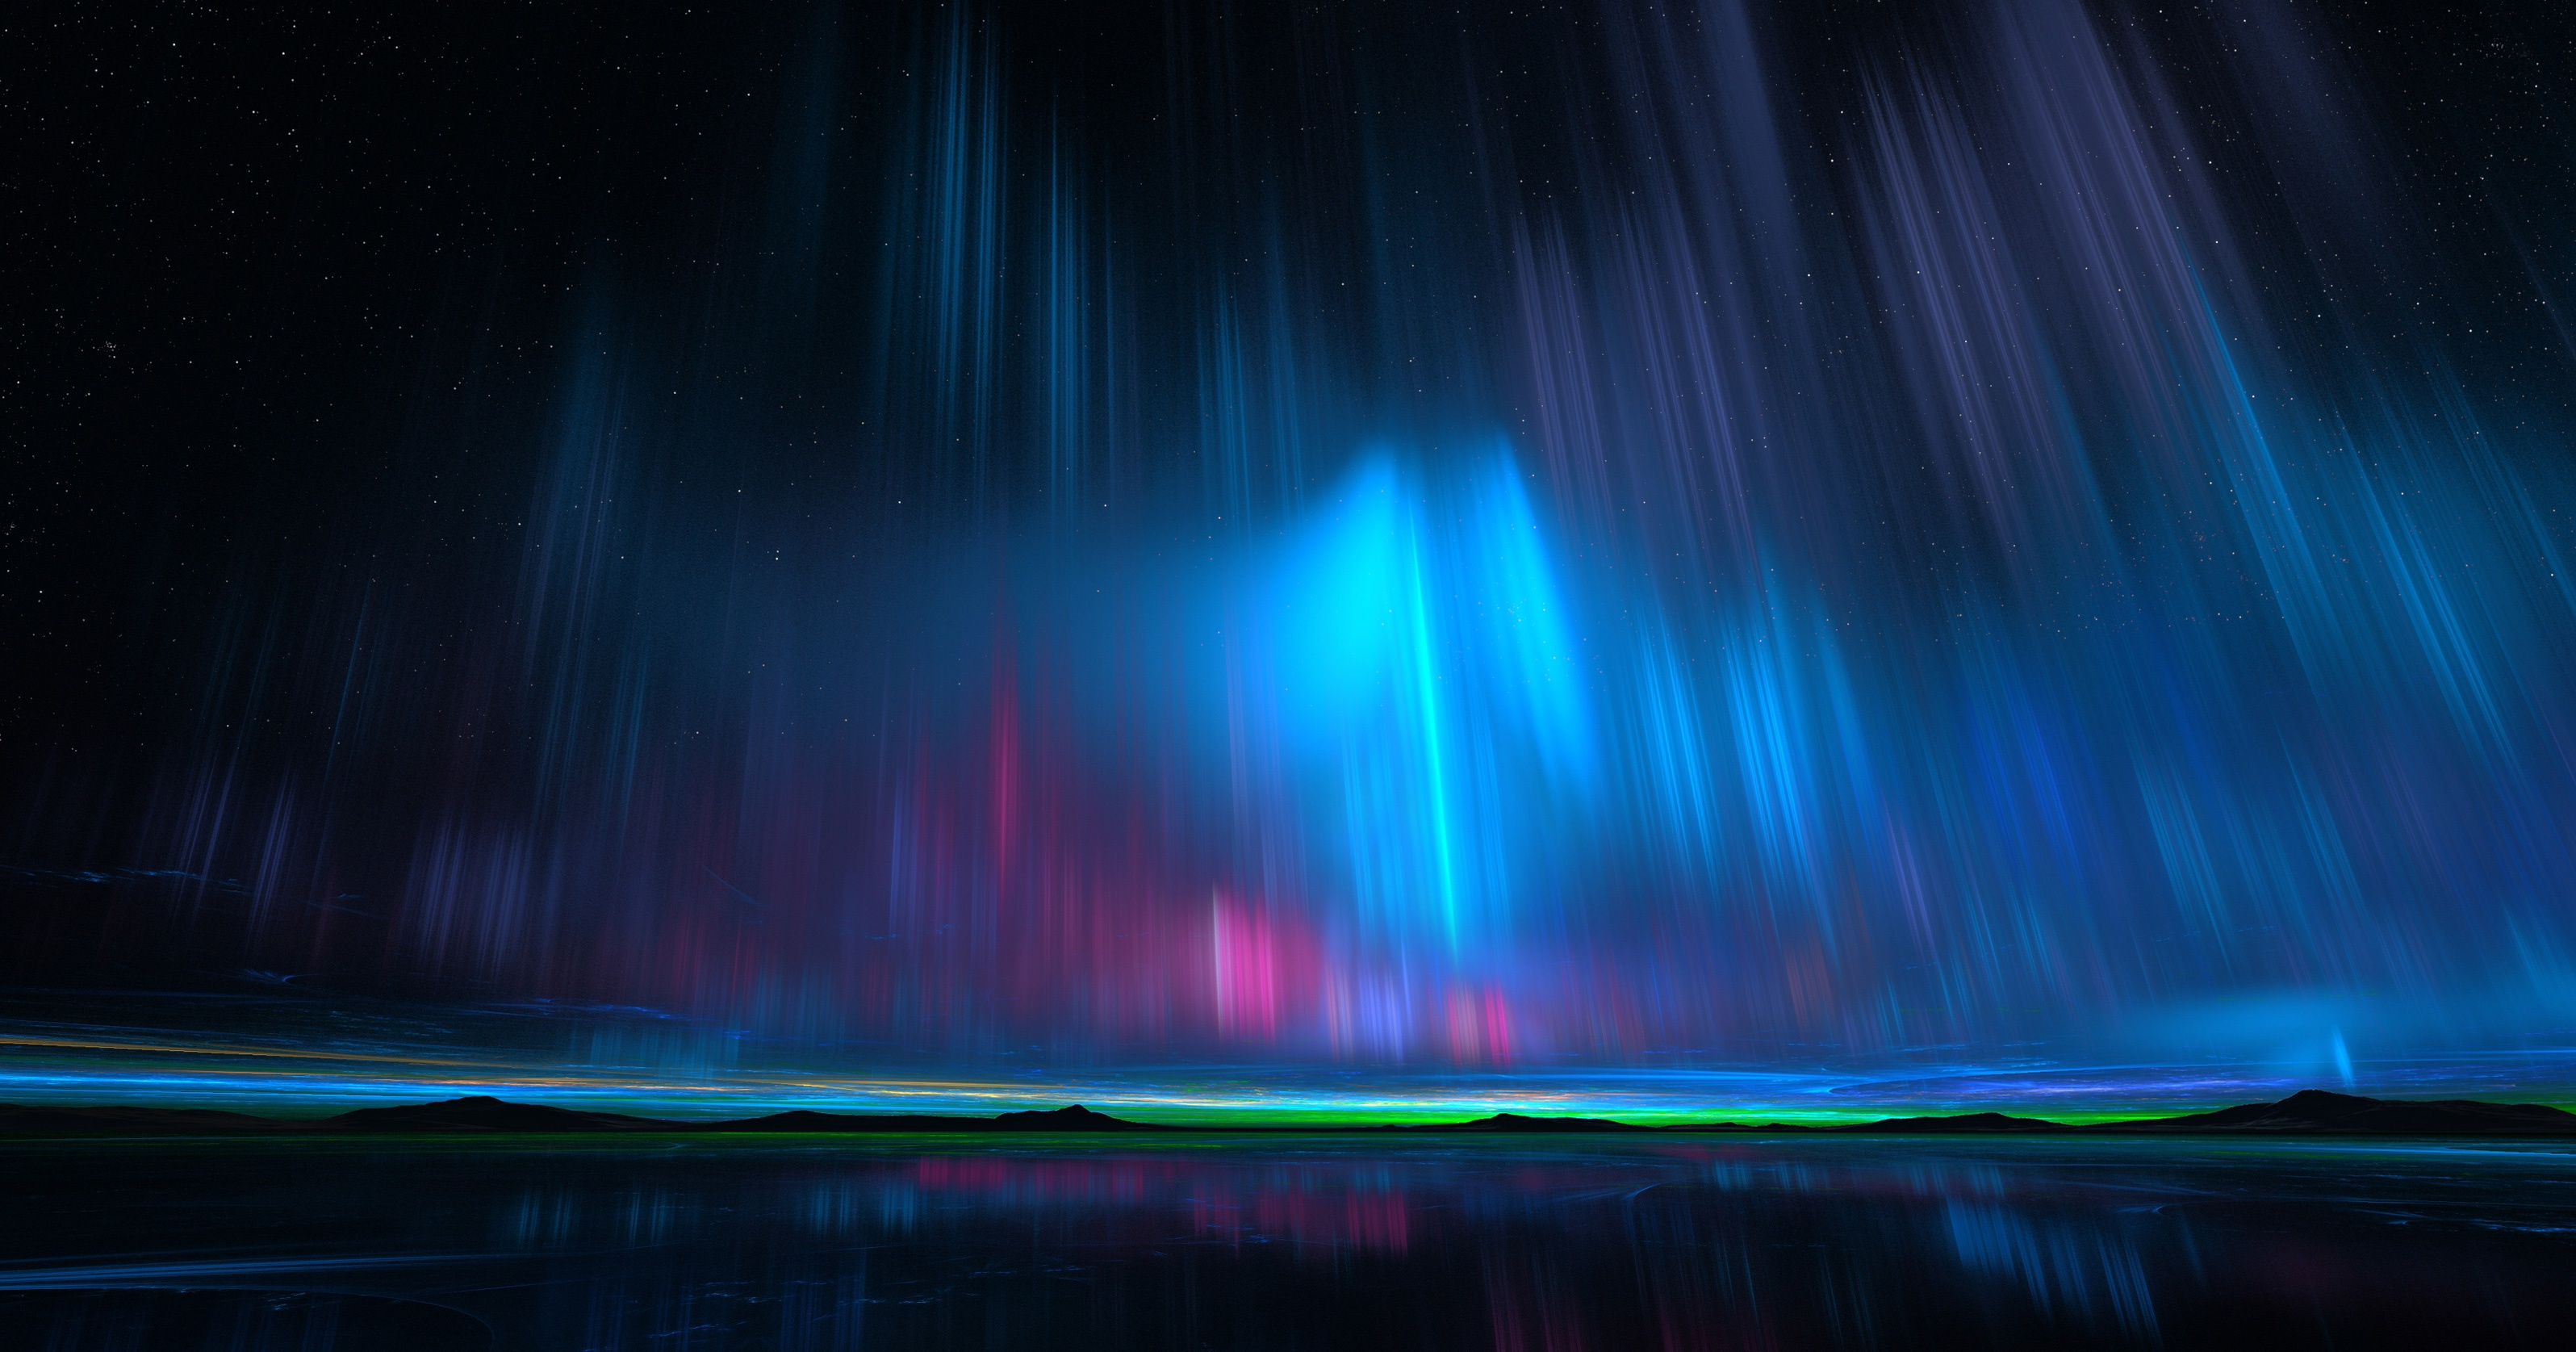 1680x1050 Aurora Borealis 1680x1050 Resolution Hd 4k